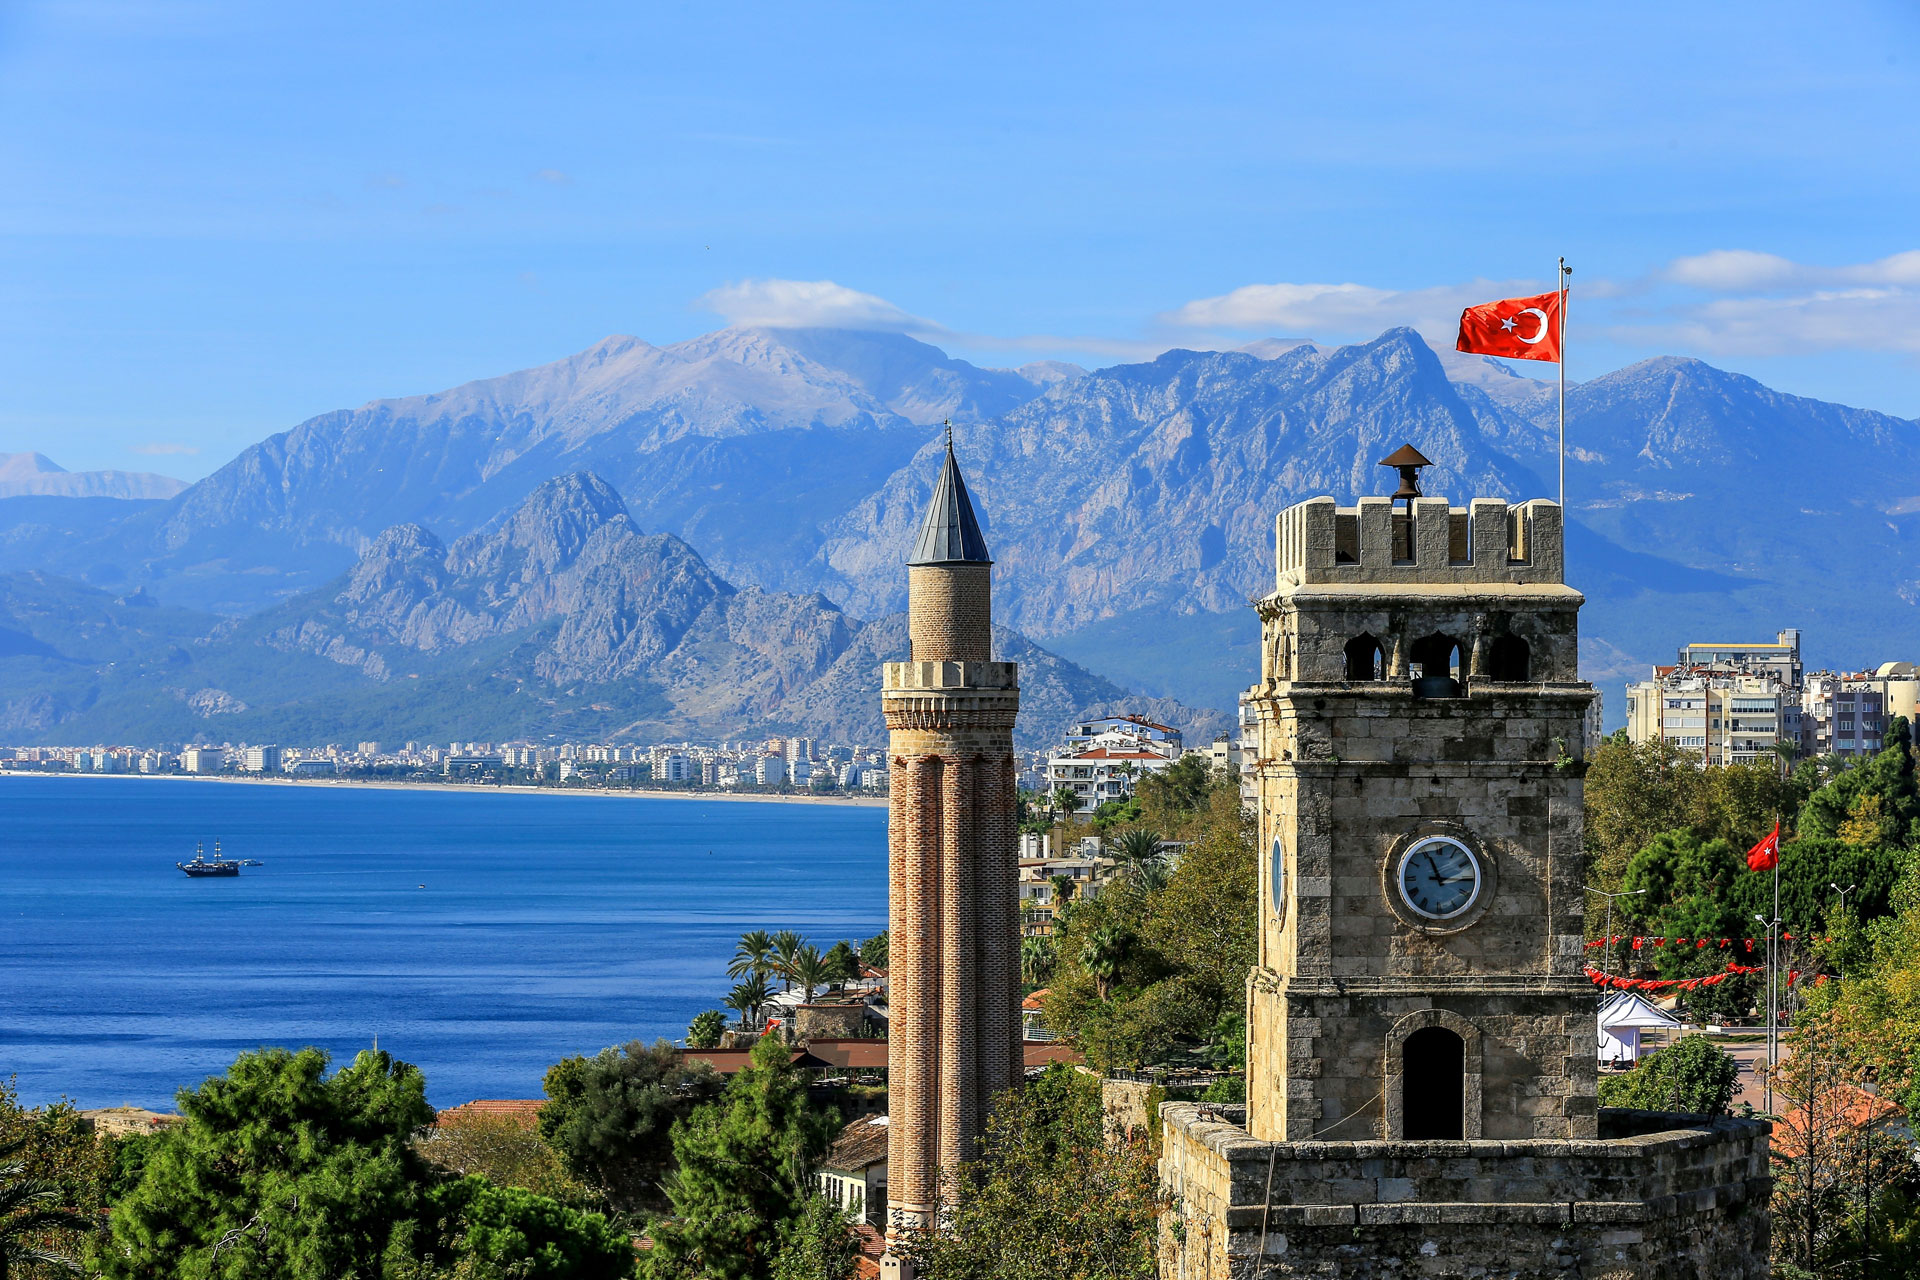 KURBAN BAYRAMINDA ANTALYA -ALANYA-KEMER  GÖLLER YÖRESİ TURU